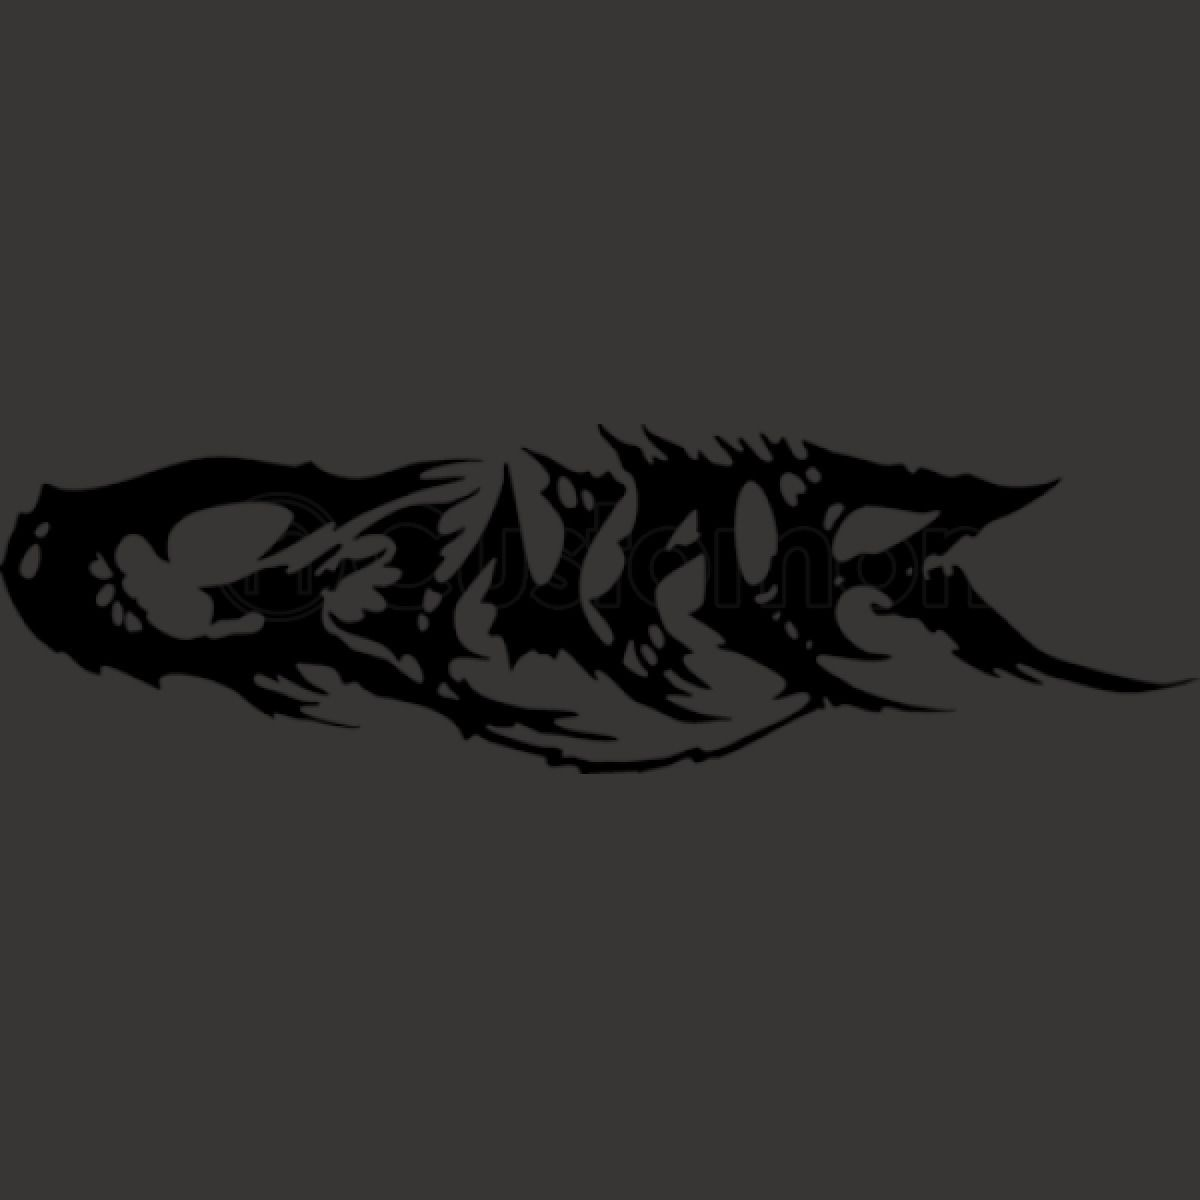 gwar logo Kids Hoodie - Customon